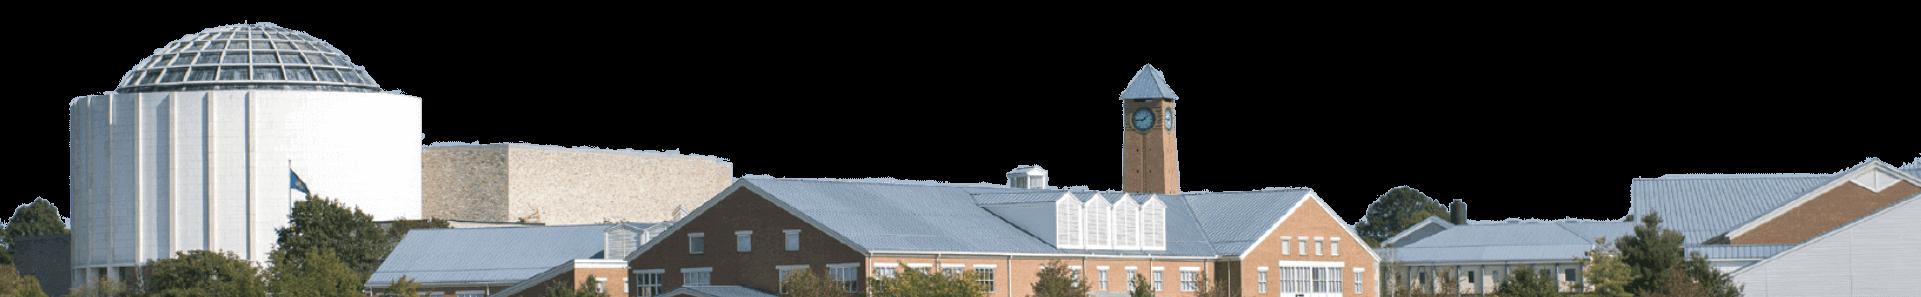 Milton Hershey School skyline